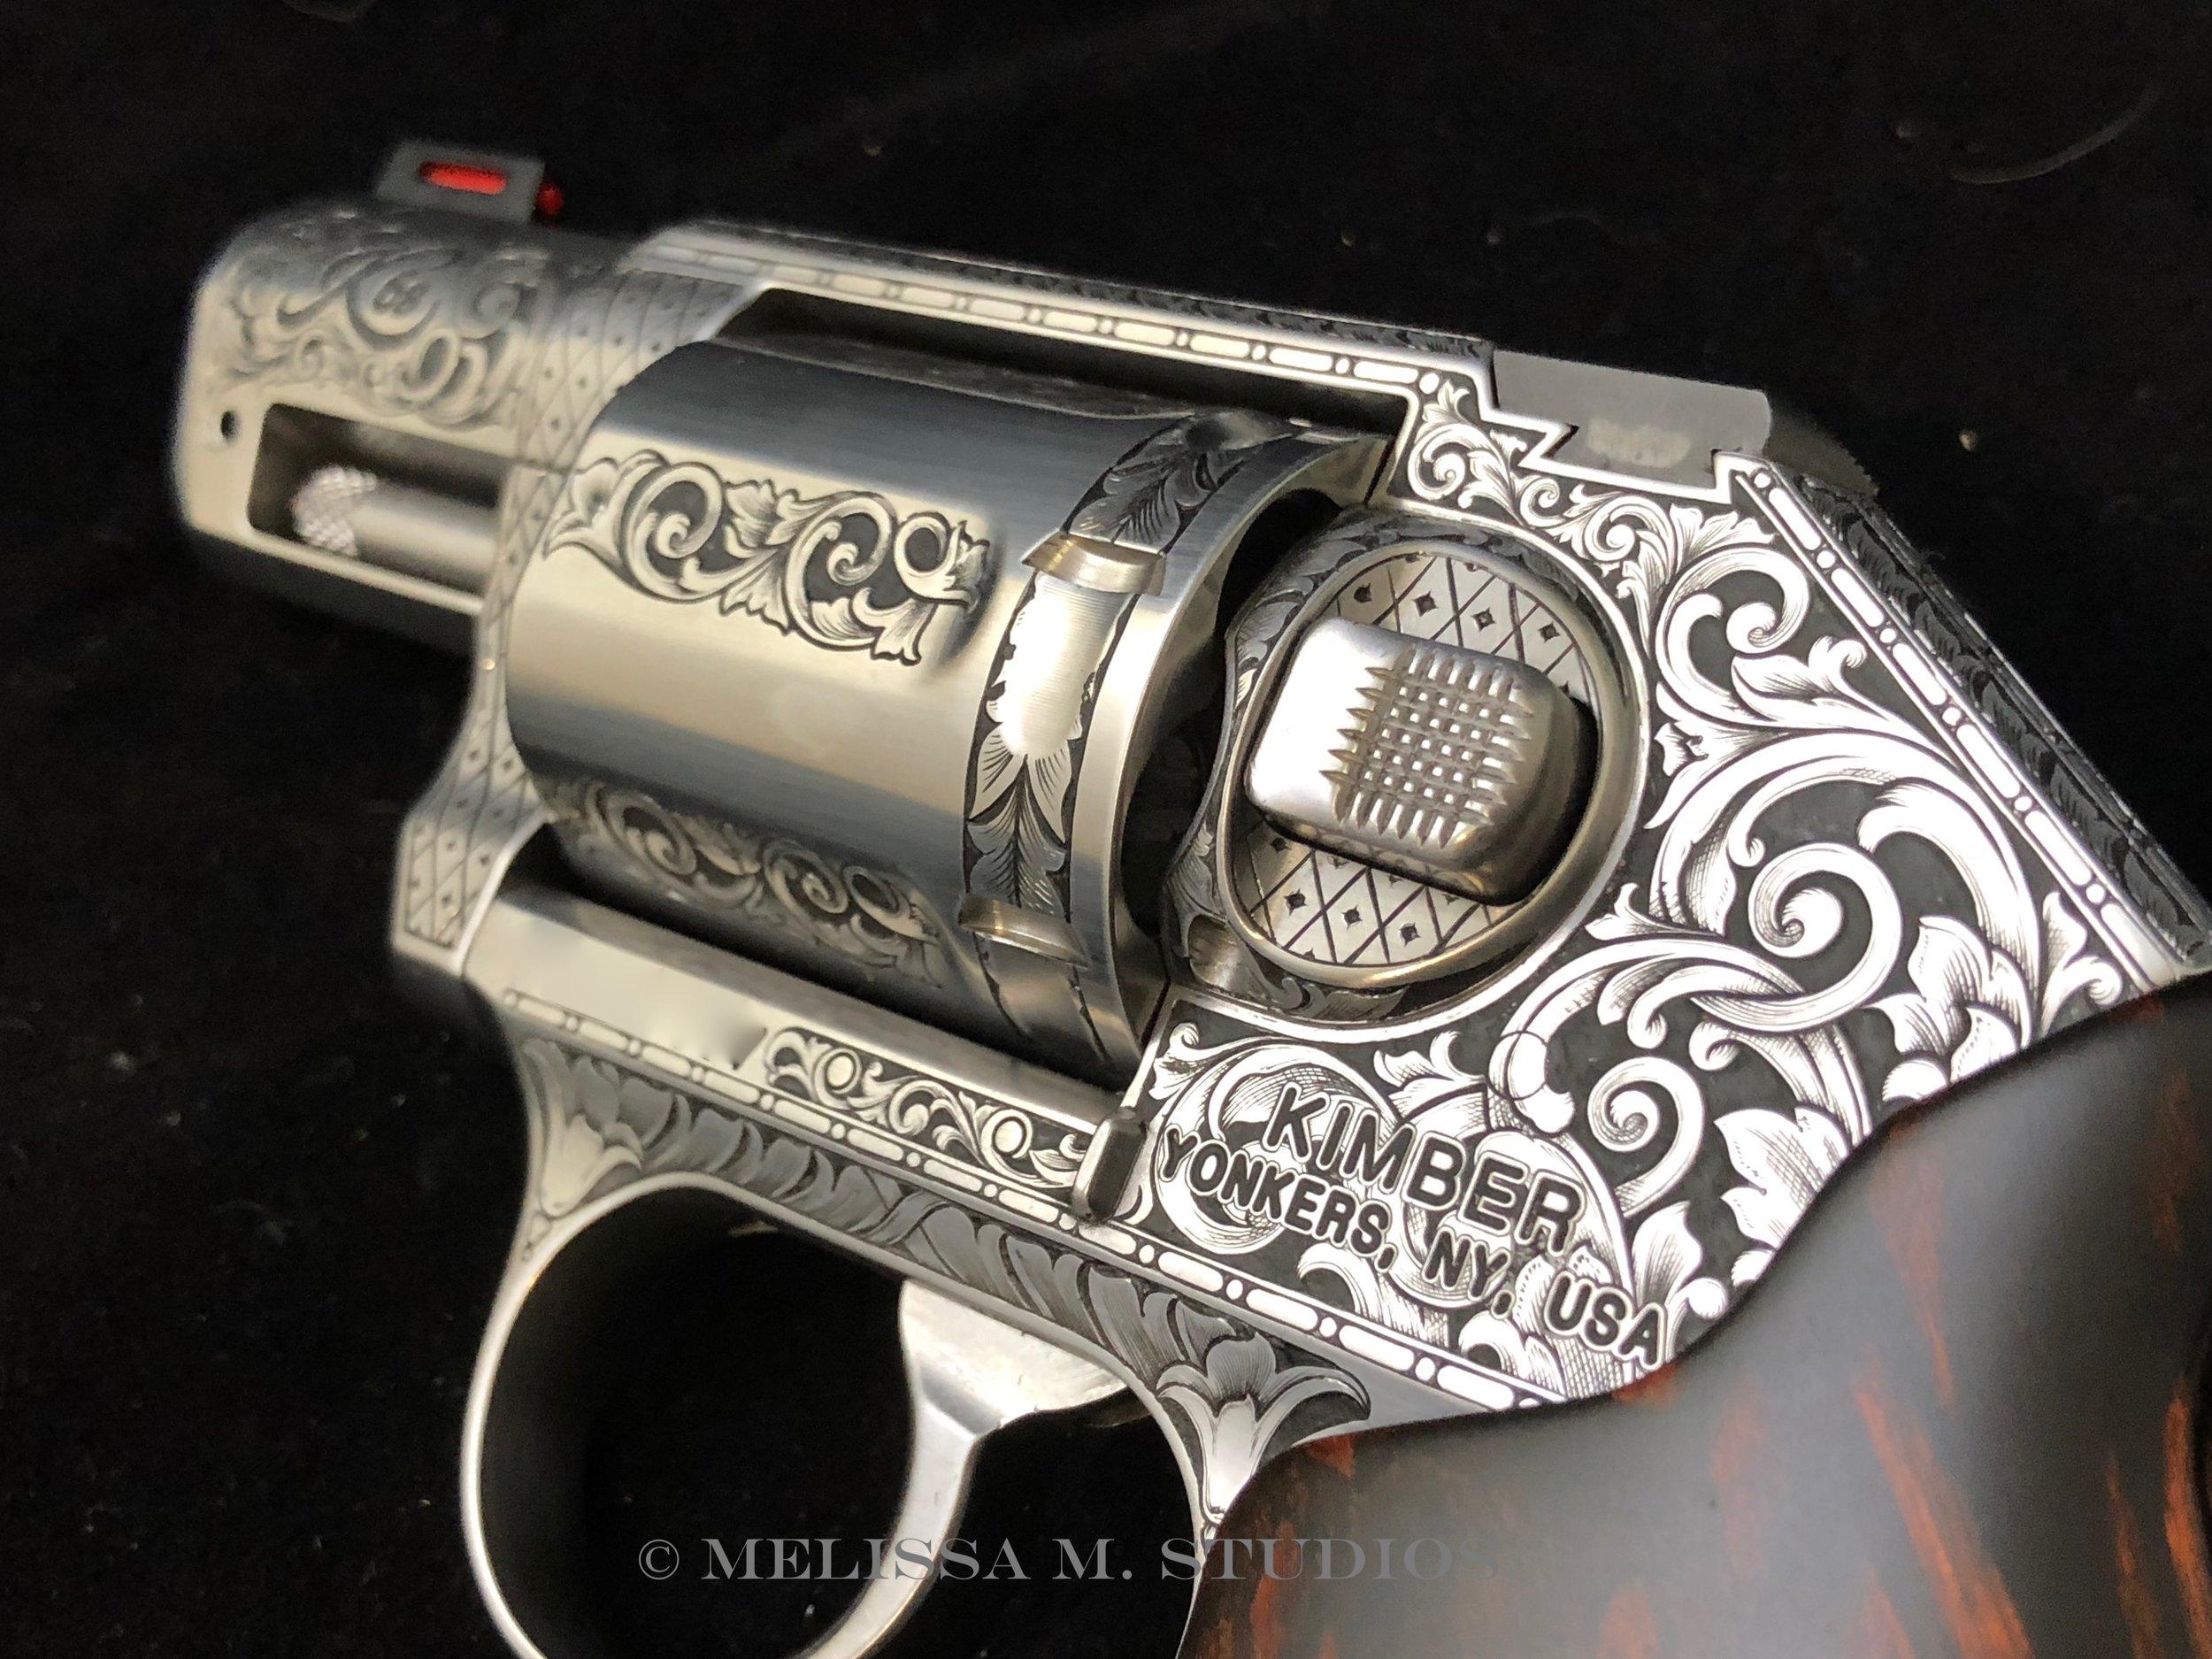 Western Engraved Revolver - Kimber K6s